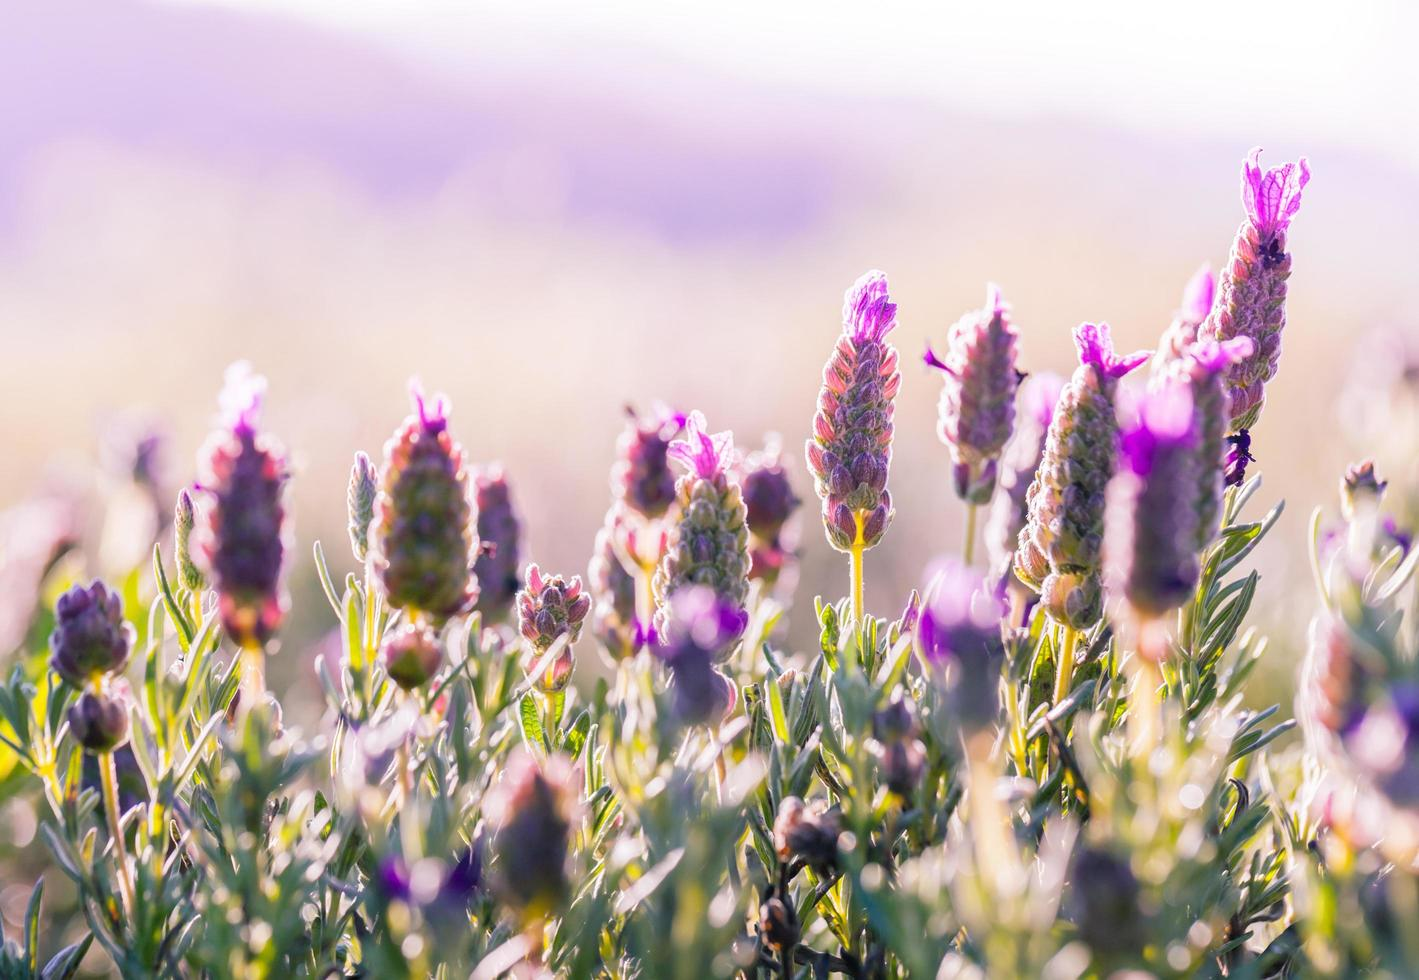 Violet flowers field photo